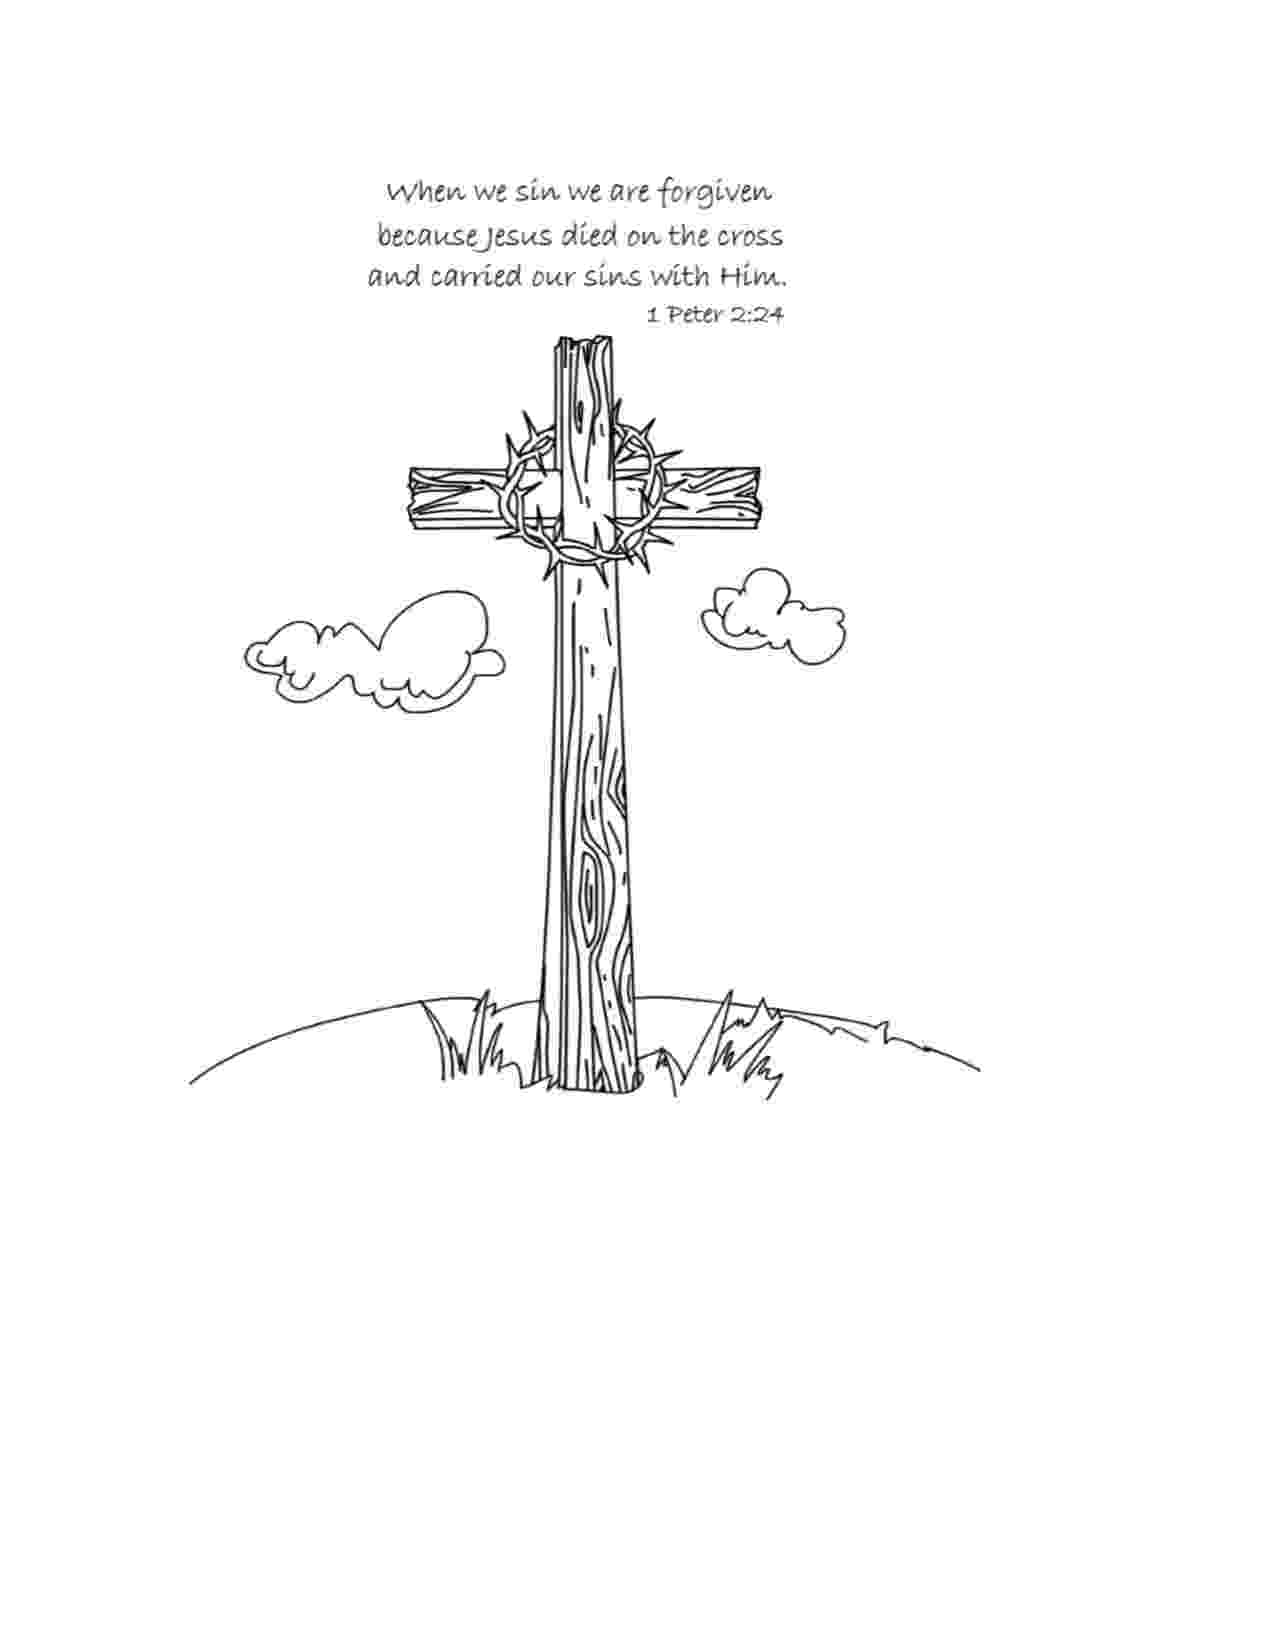 coloring pictures of jesus crucifixion jesus crucifixion coloring pages get coloring pages jesus pictures of crucifixion coloring